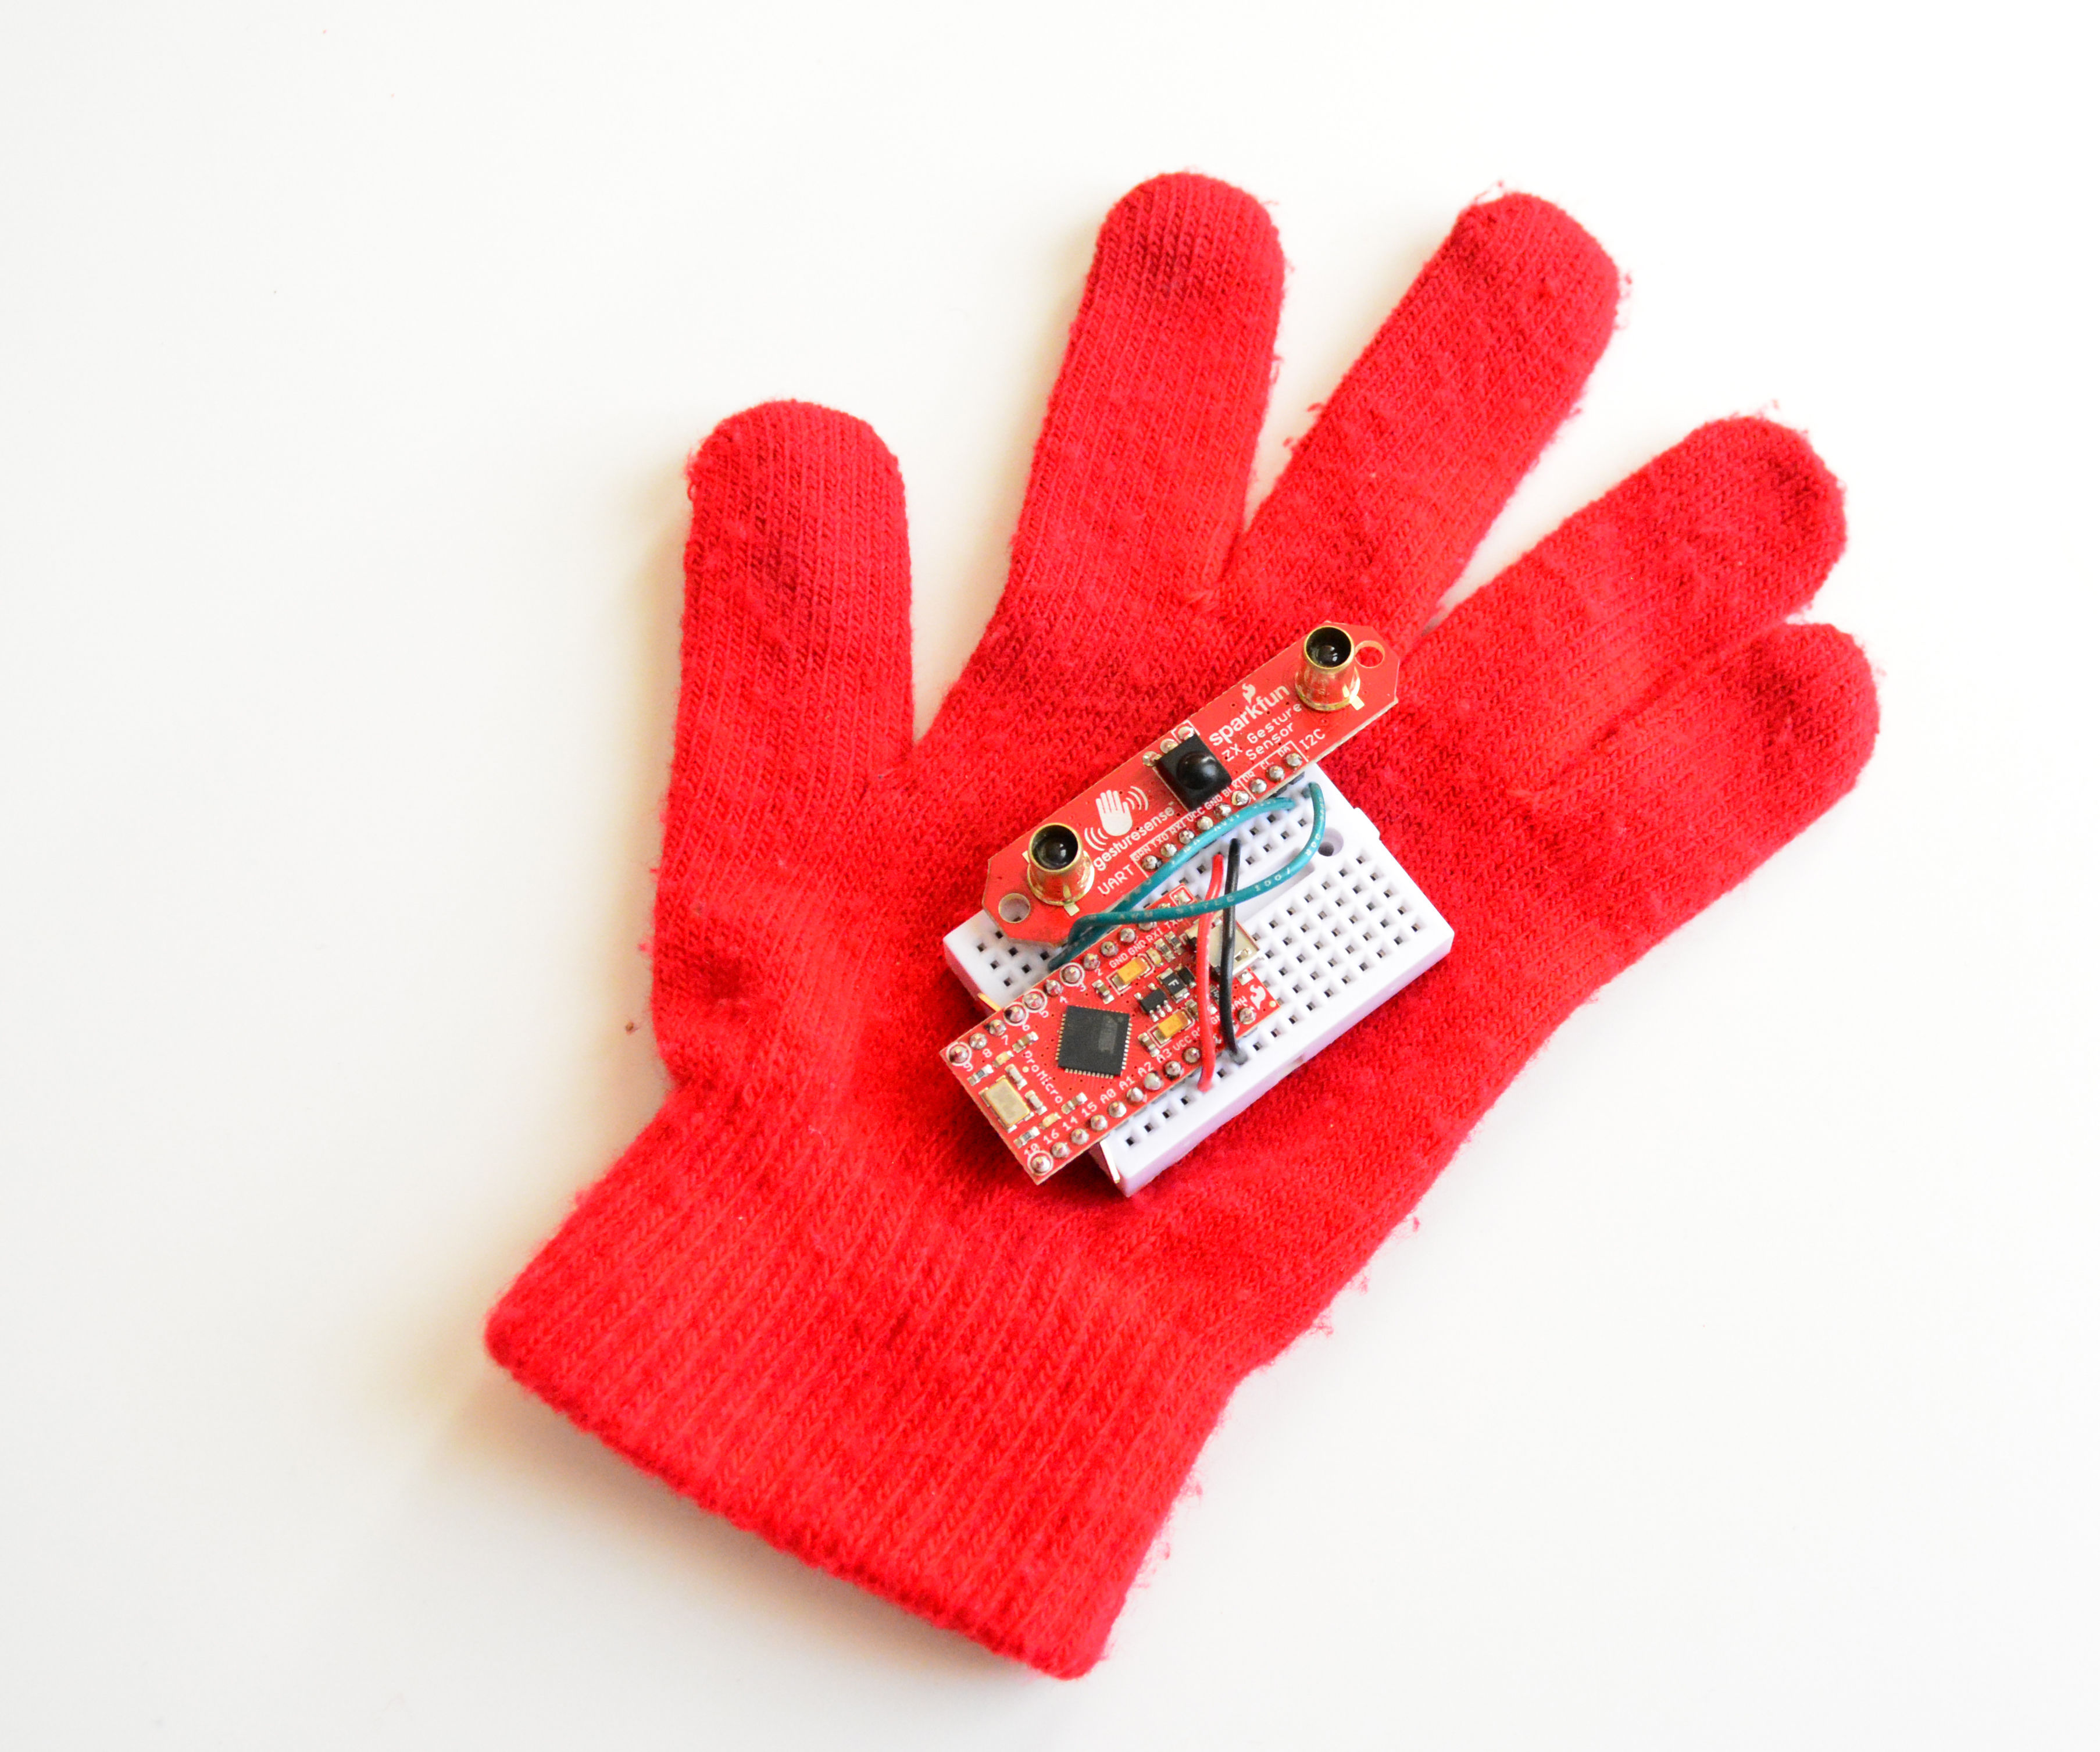 The Galaxy Glove